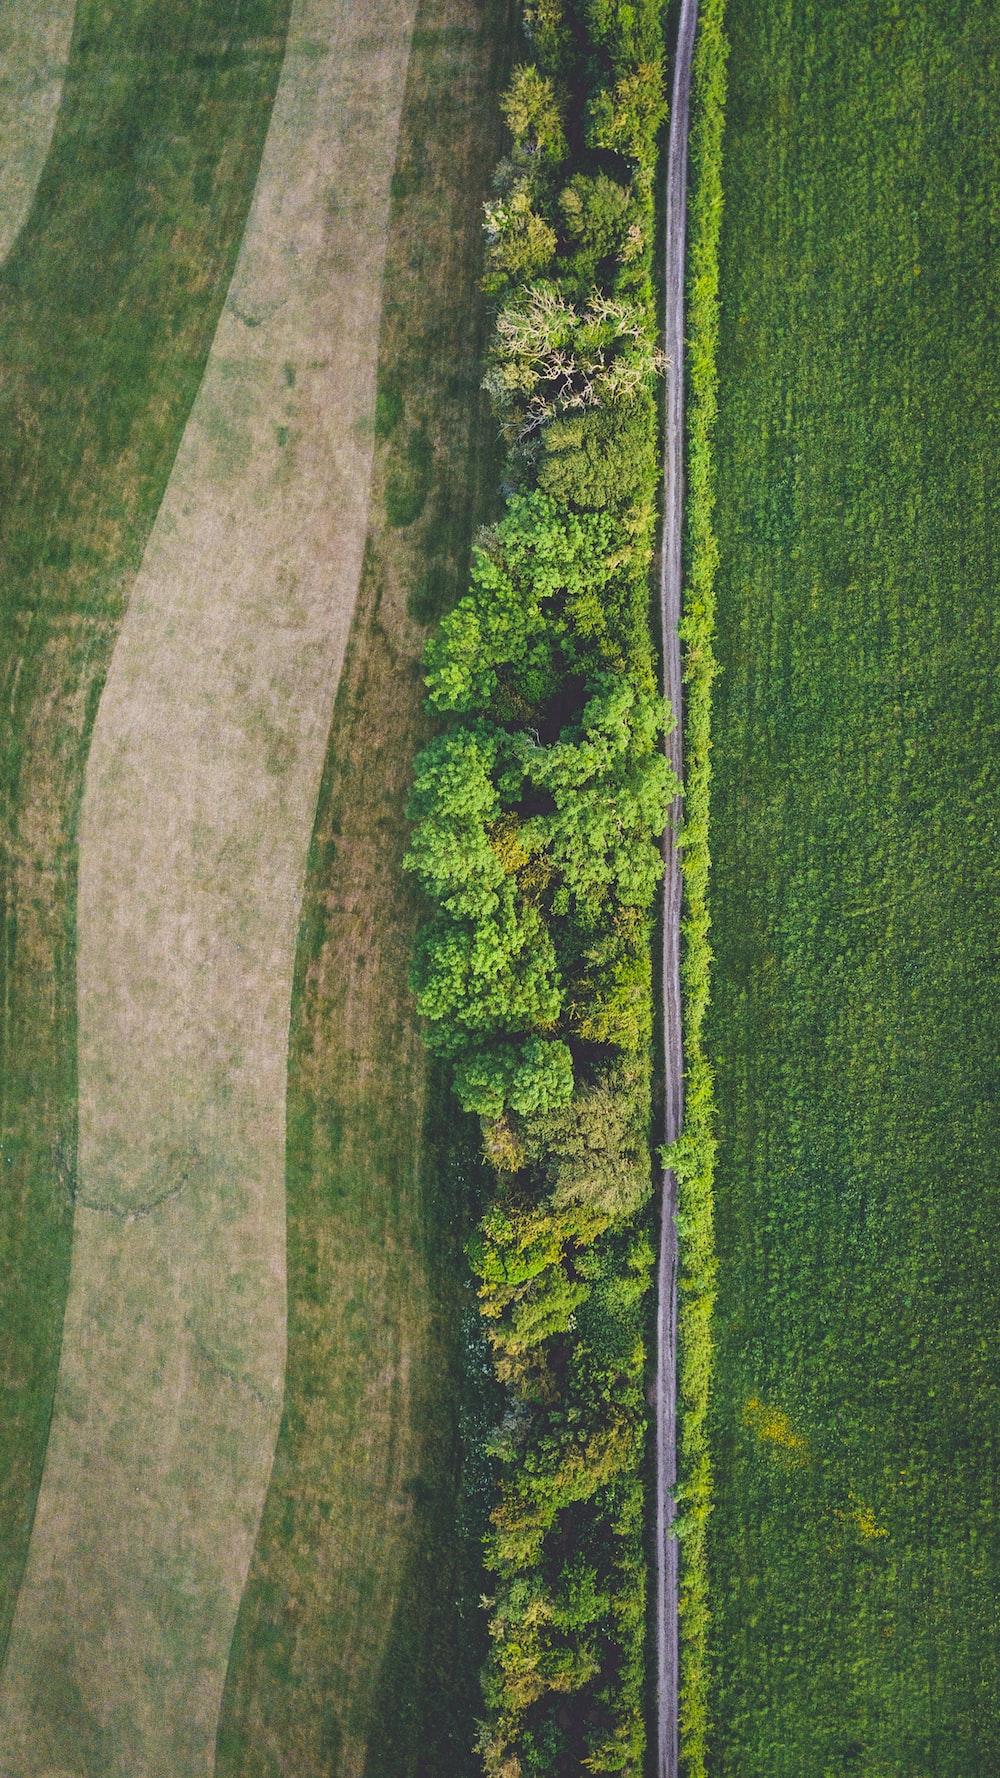 green grass field during daytime